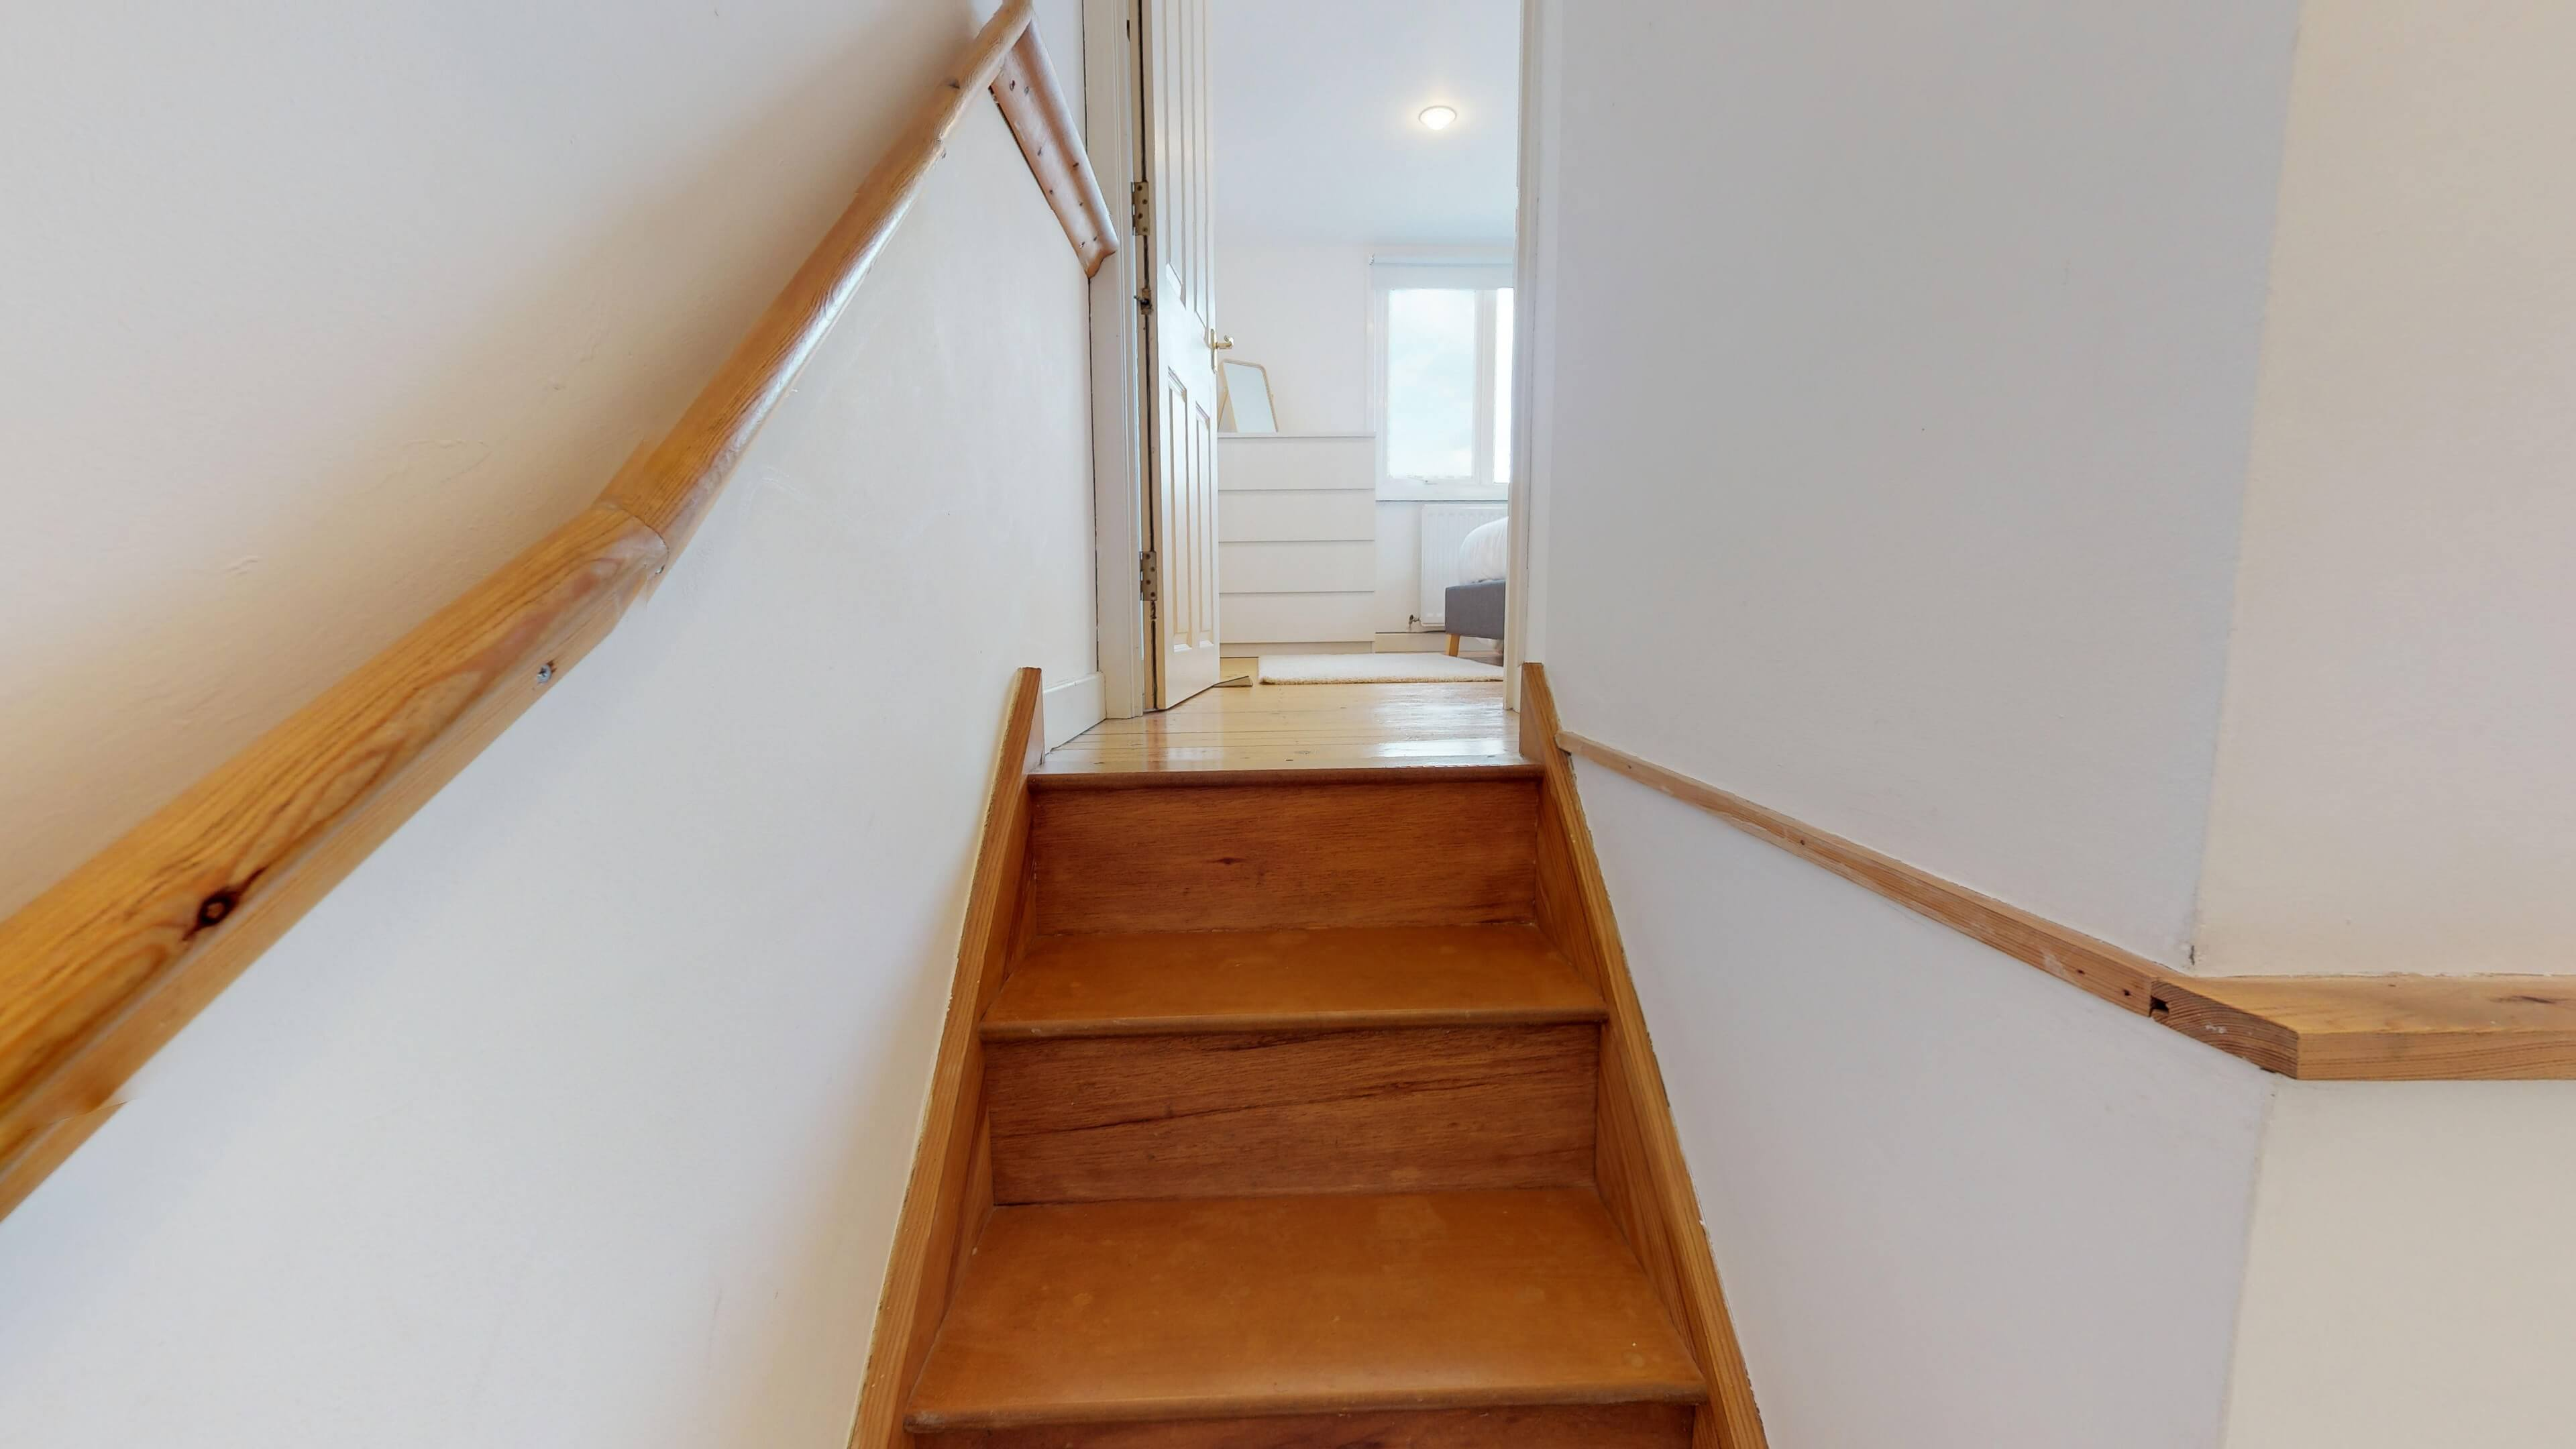 Gordon Street Stairs